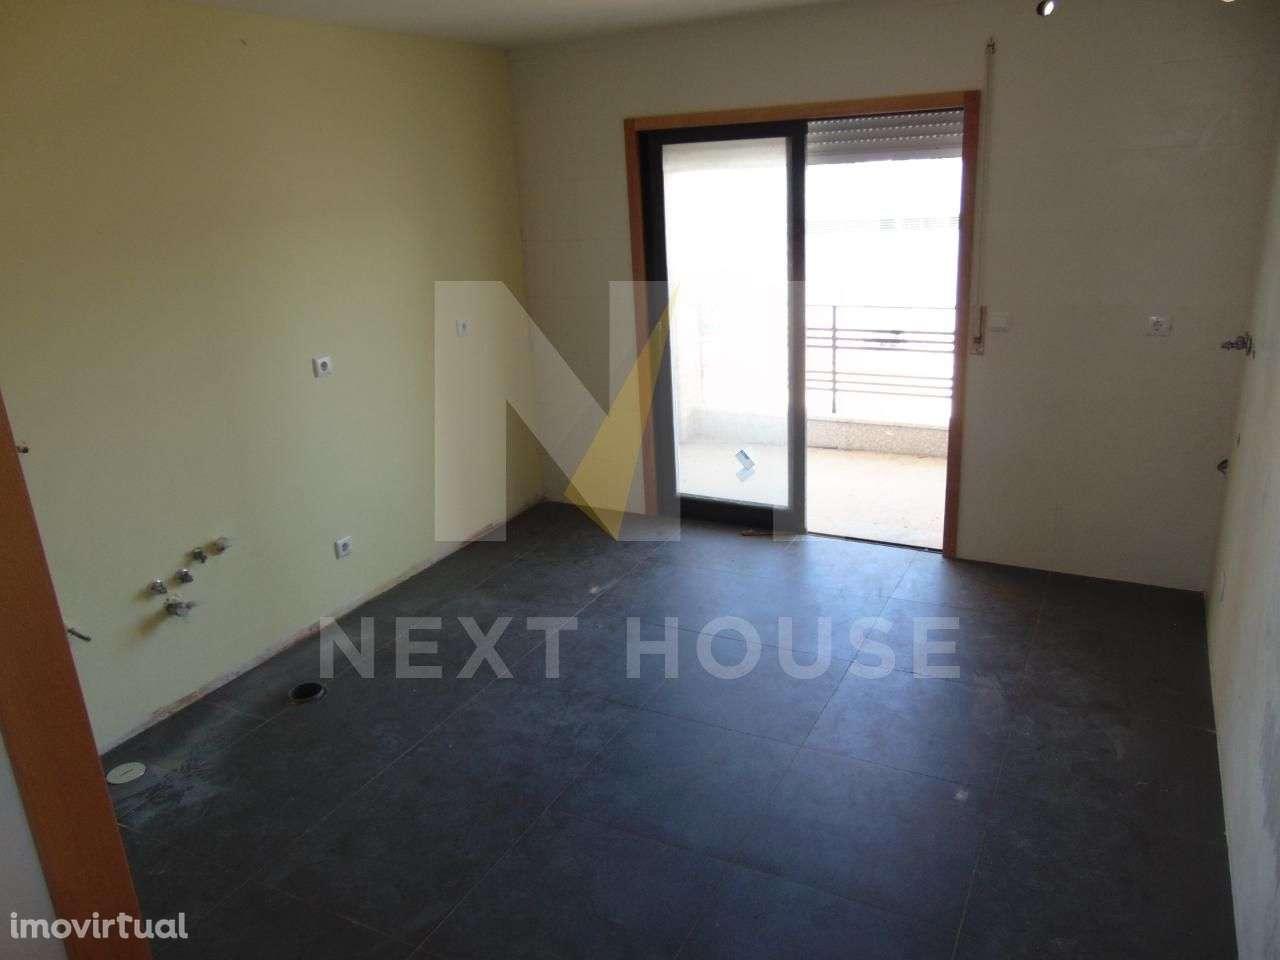 Apartamento para comprar, Gafanha da Boa Hora, Aveiro - Foto 6